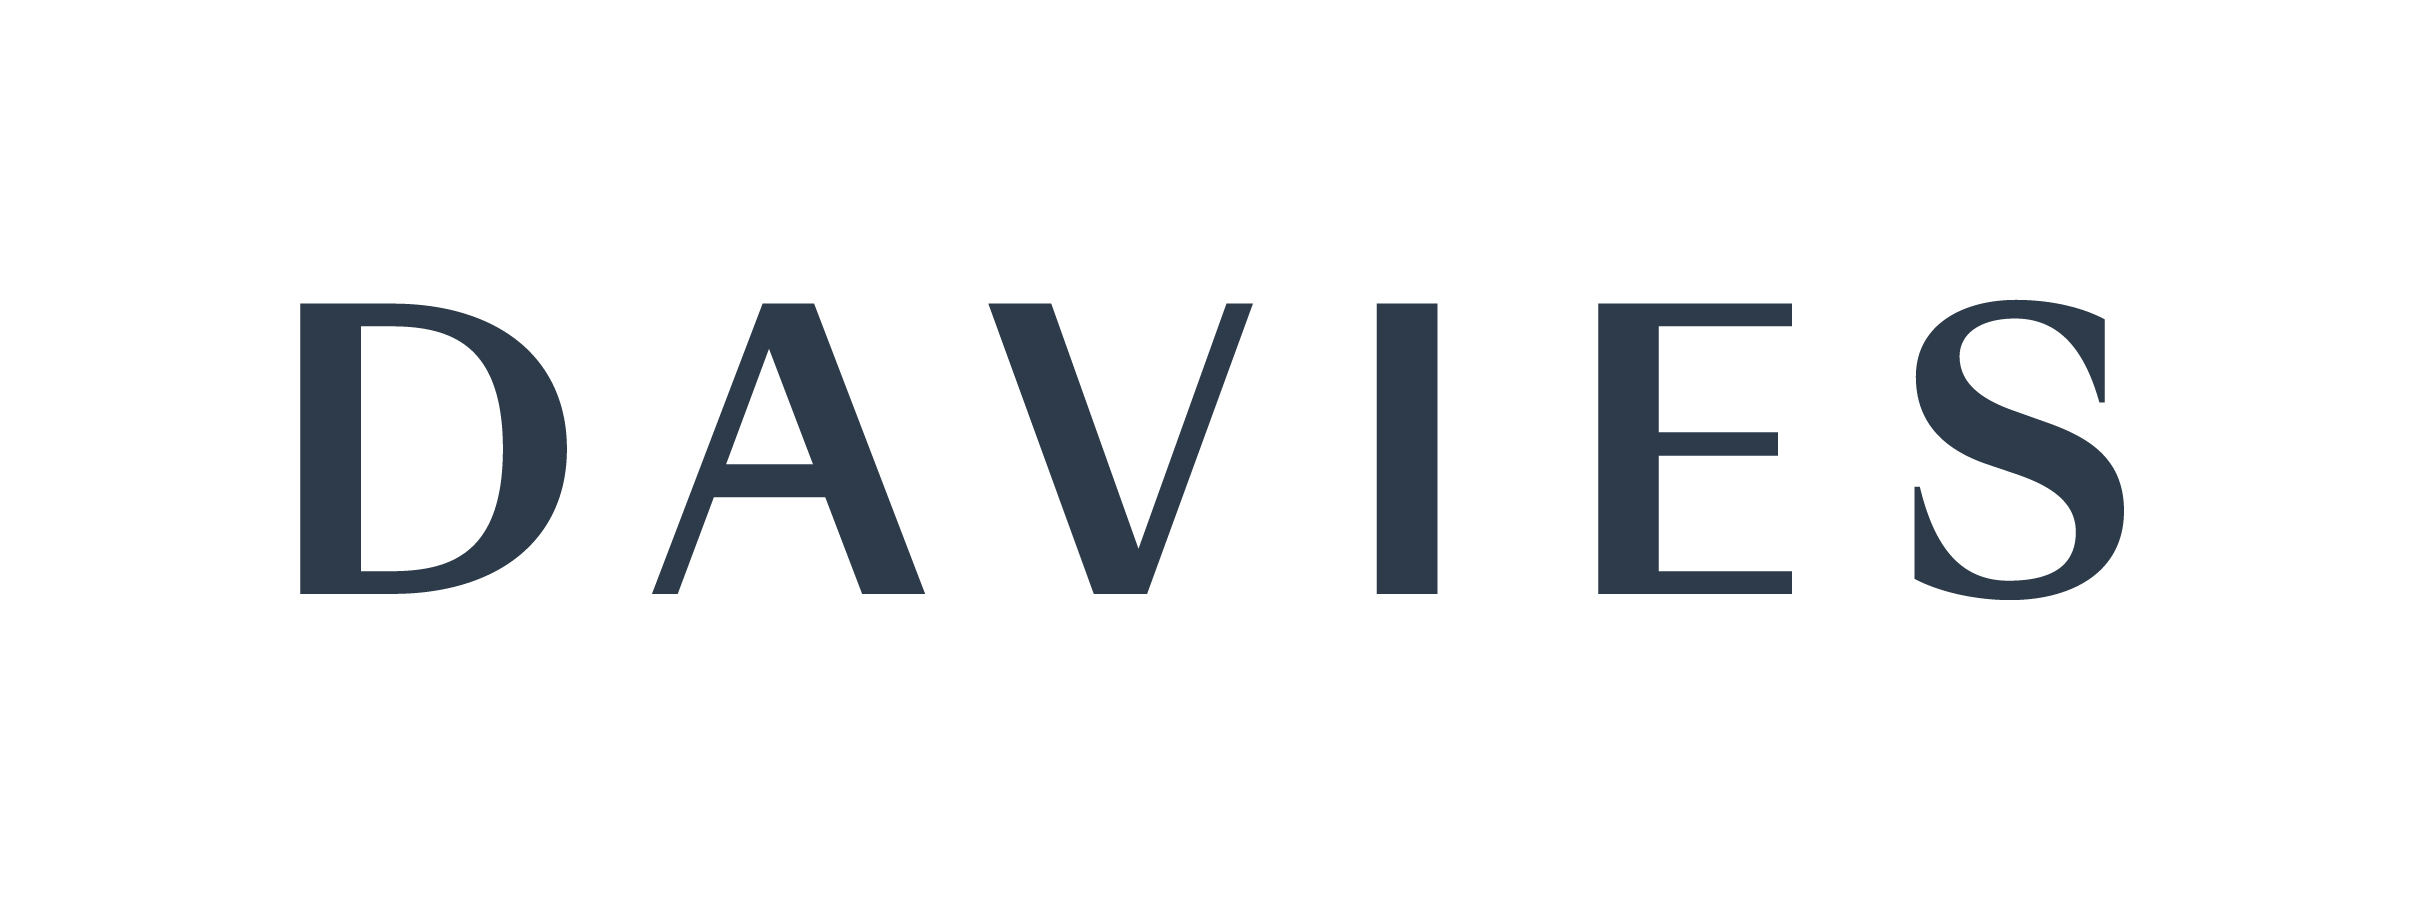 davies_logo_blue_rgb_300_sp (1).jpg